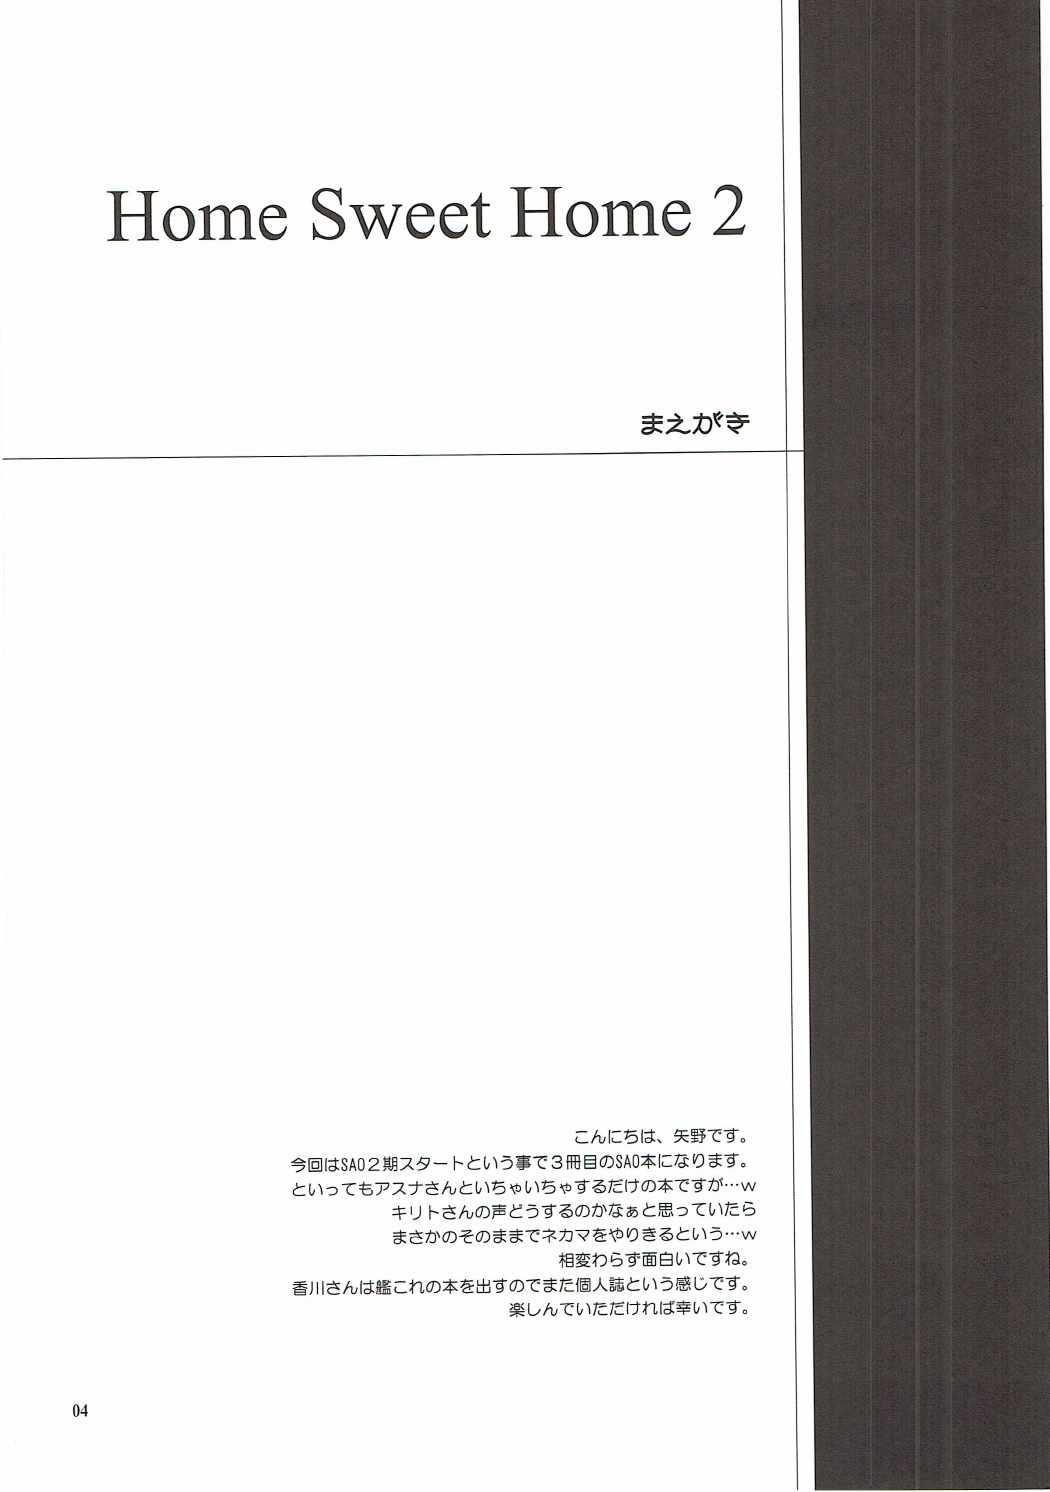 Home Sweet Home 2 2